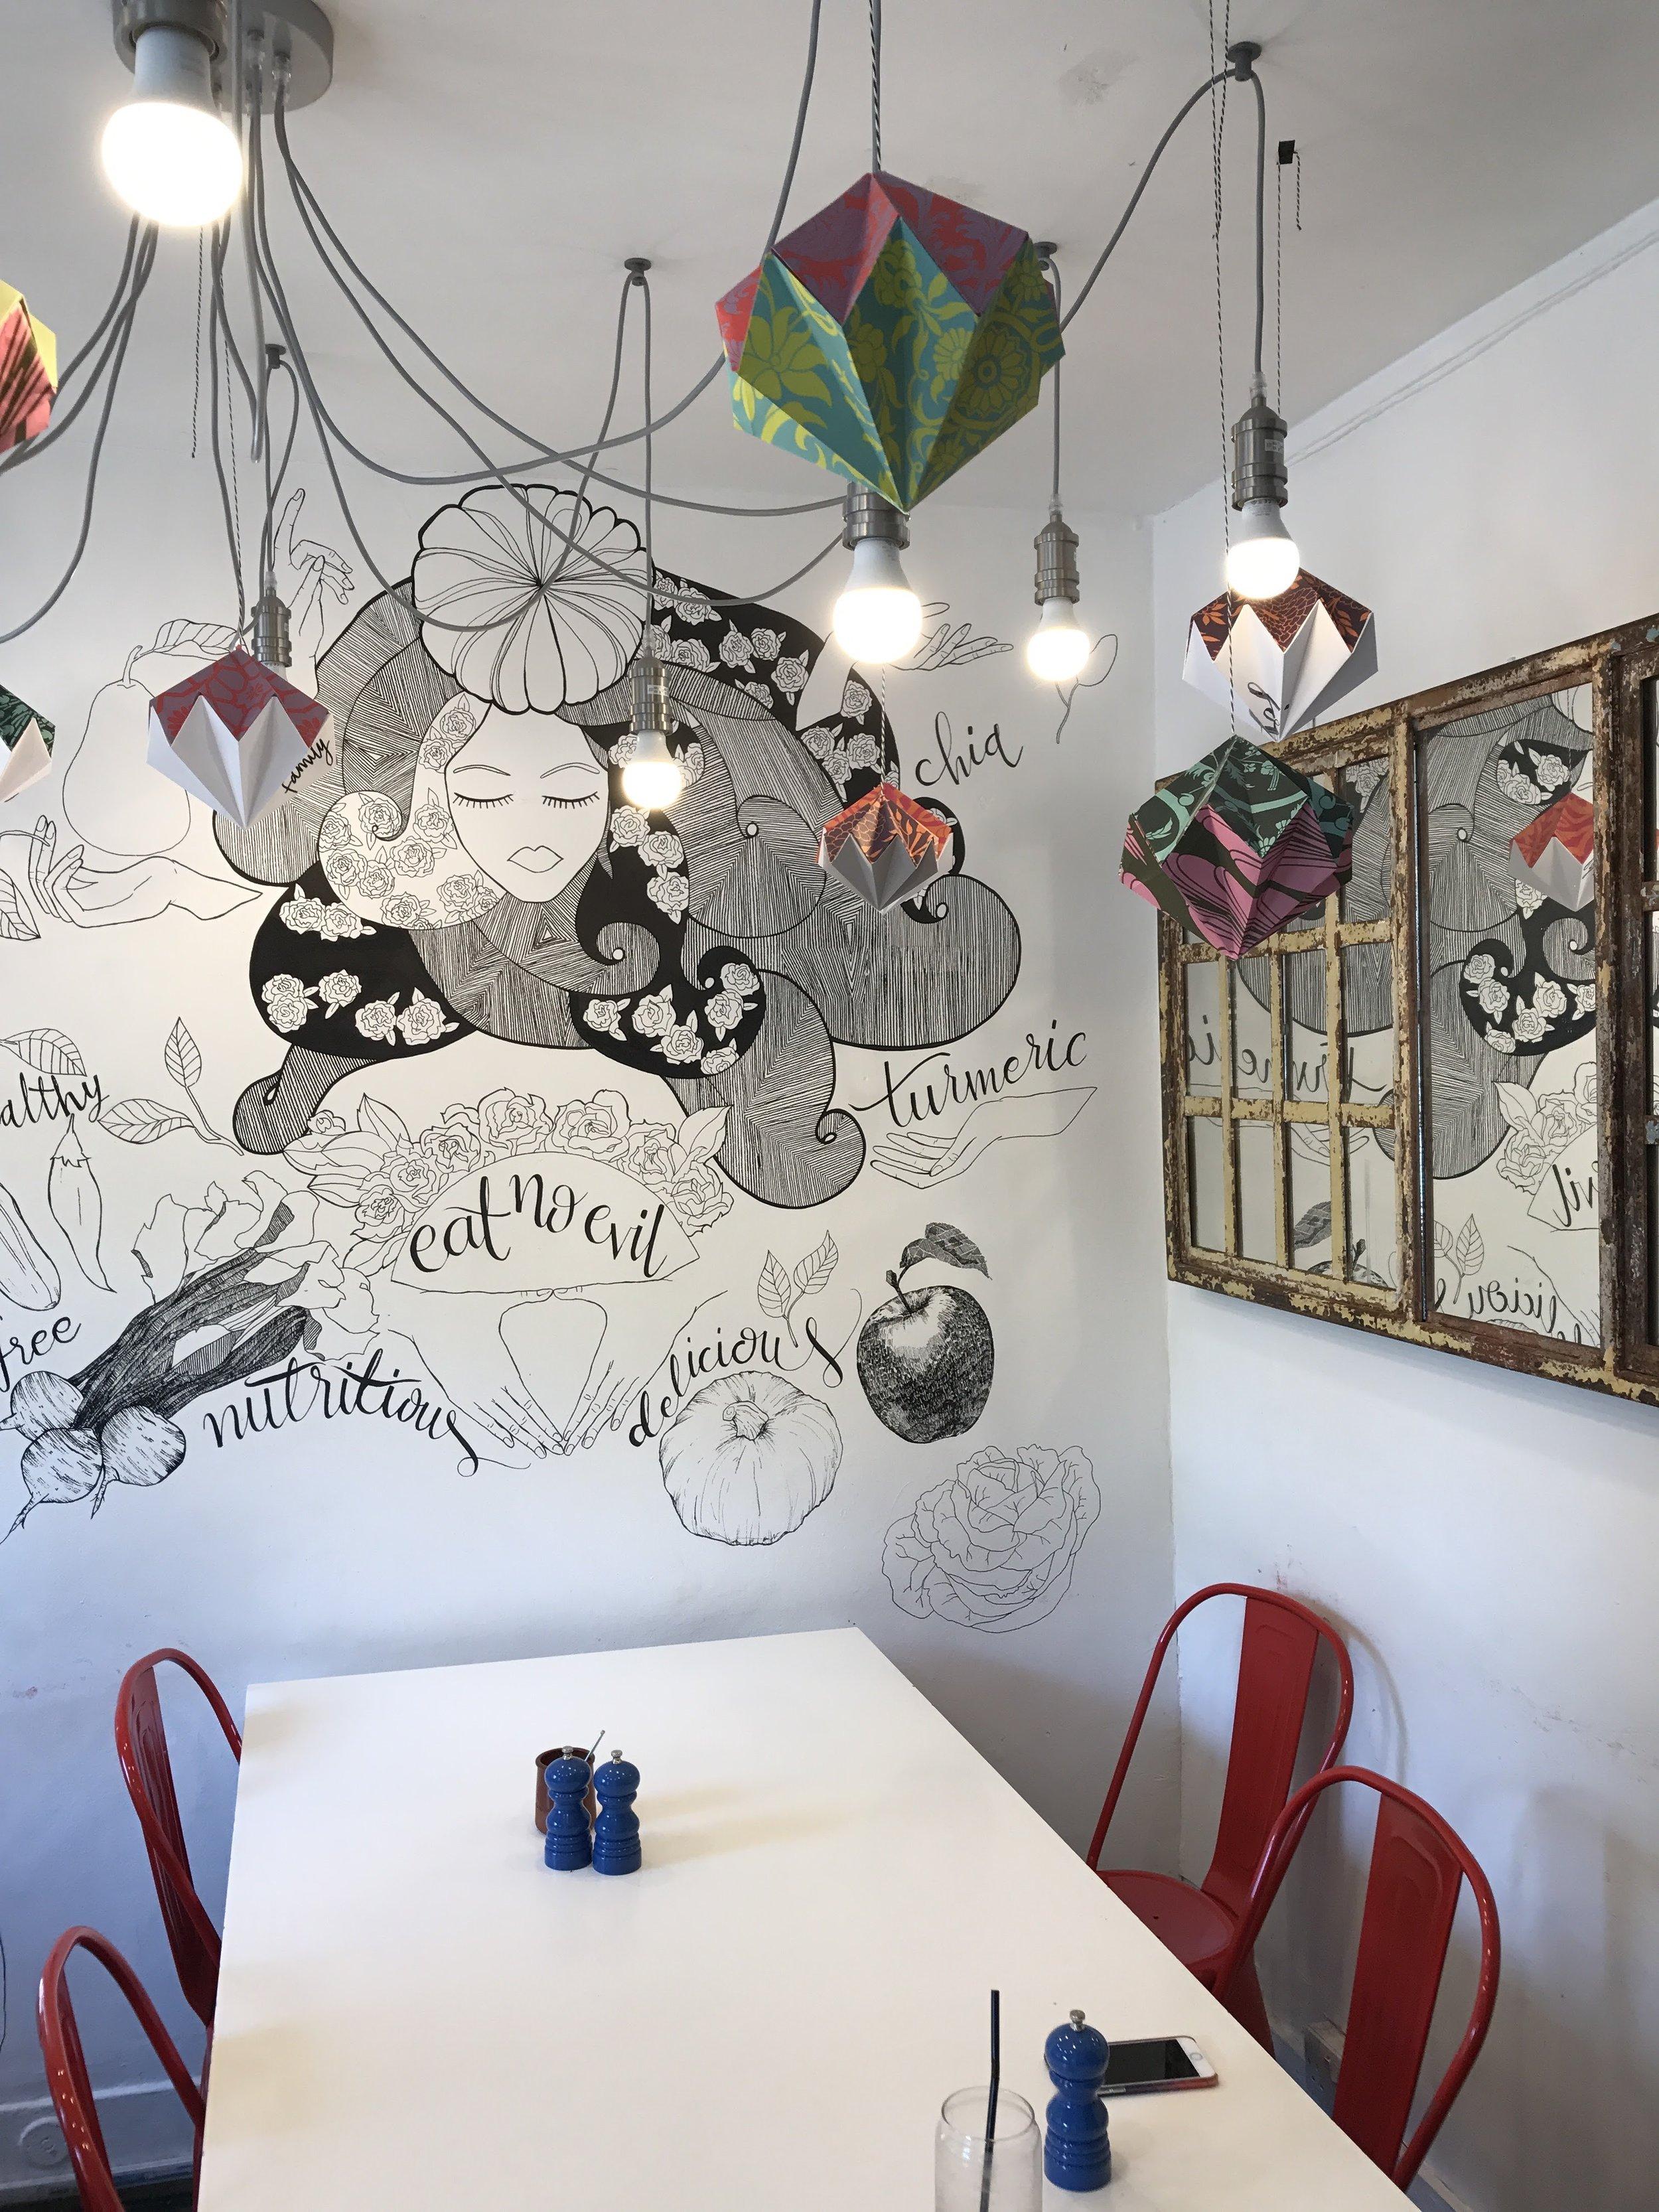 Lls Cafe Les Filles Hampstead Paddington Wall Art Mural Thislakshmi